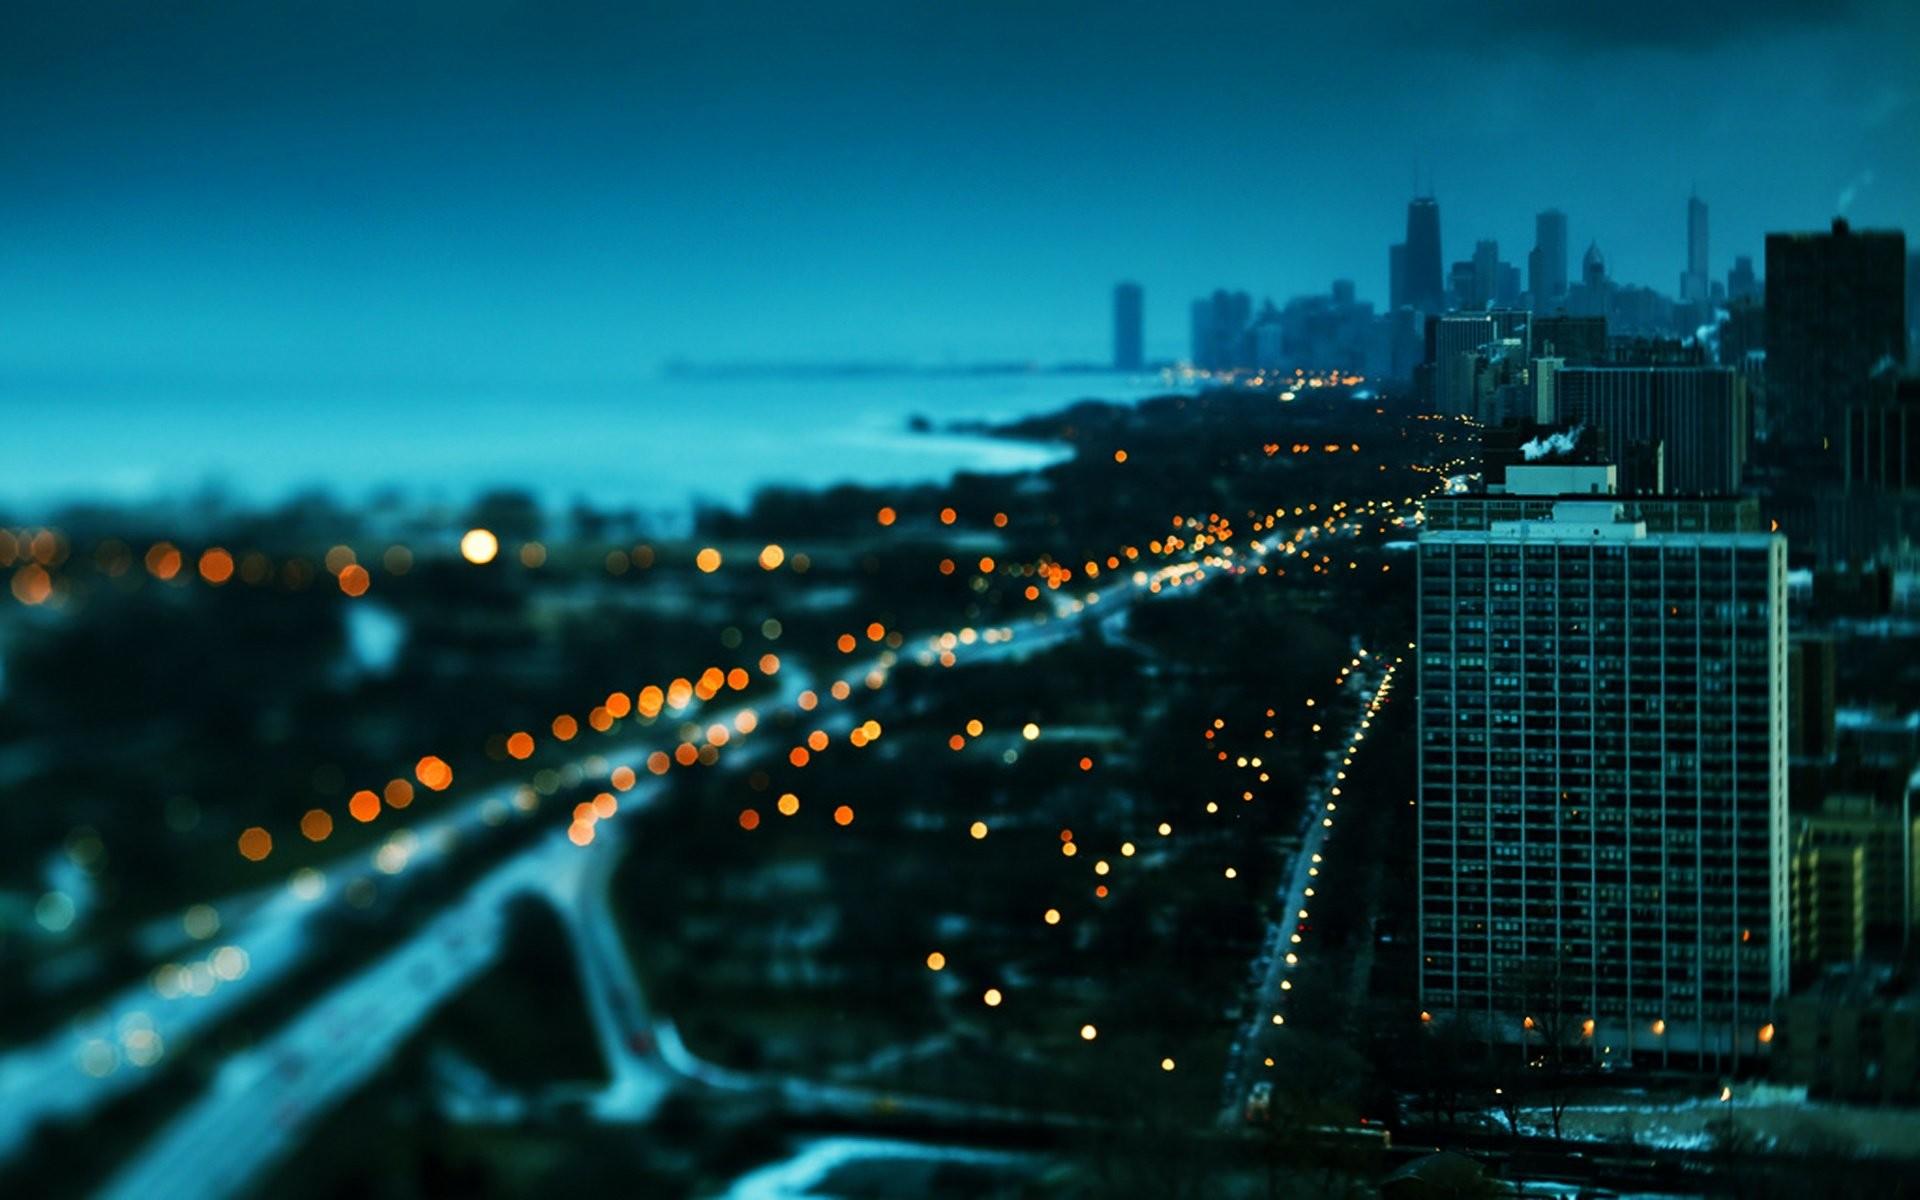 iphone chicago cubs wallpaper sharovarka Pinterest Chicago